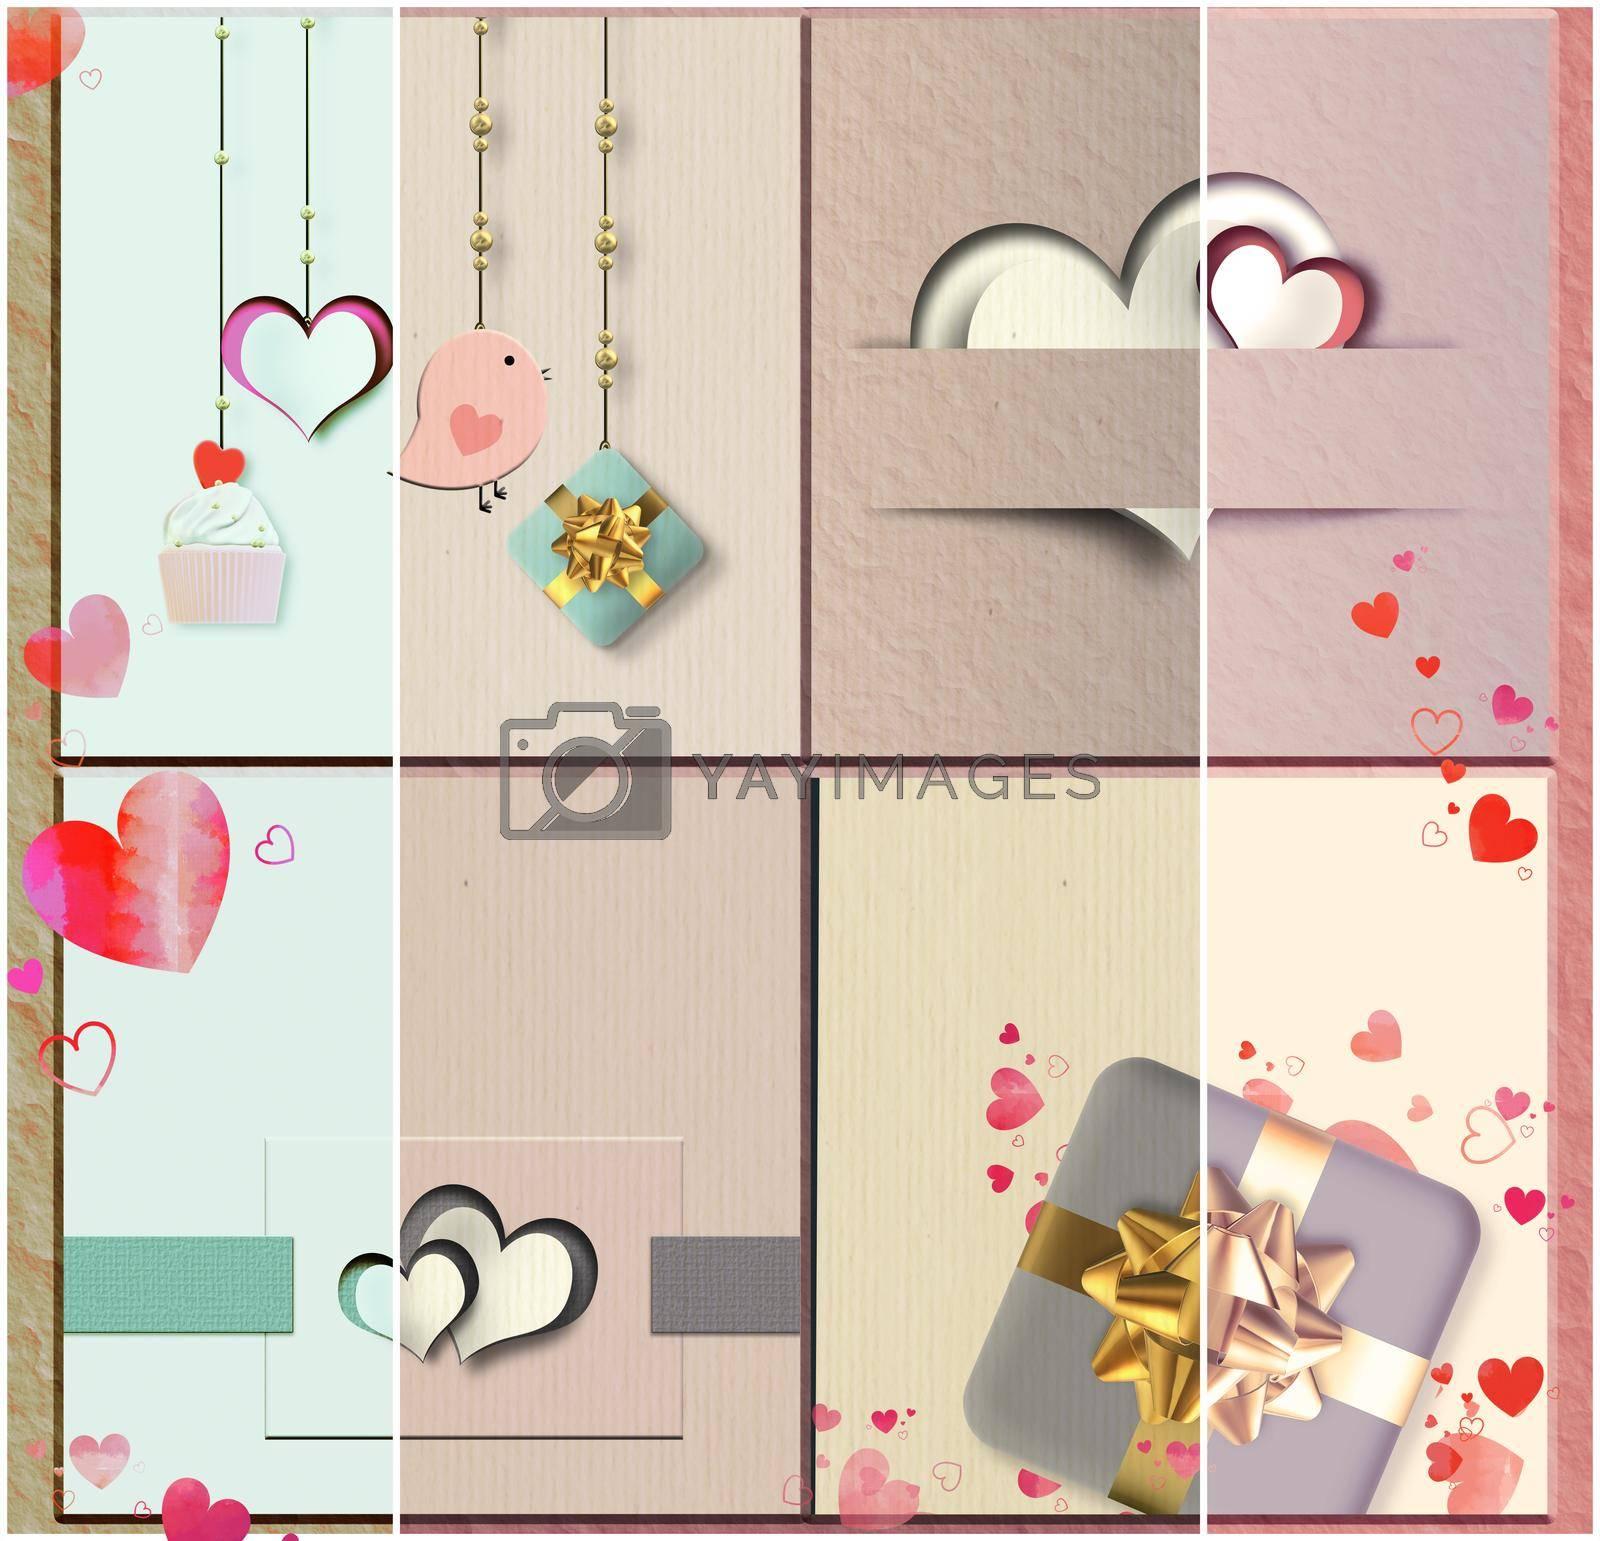 Vintage love collage for Valentine, wedding birthday card. Pastel Vintage collection. 3D illustration